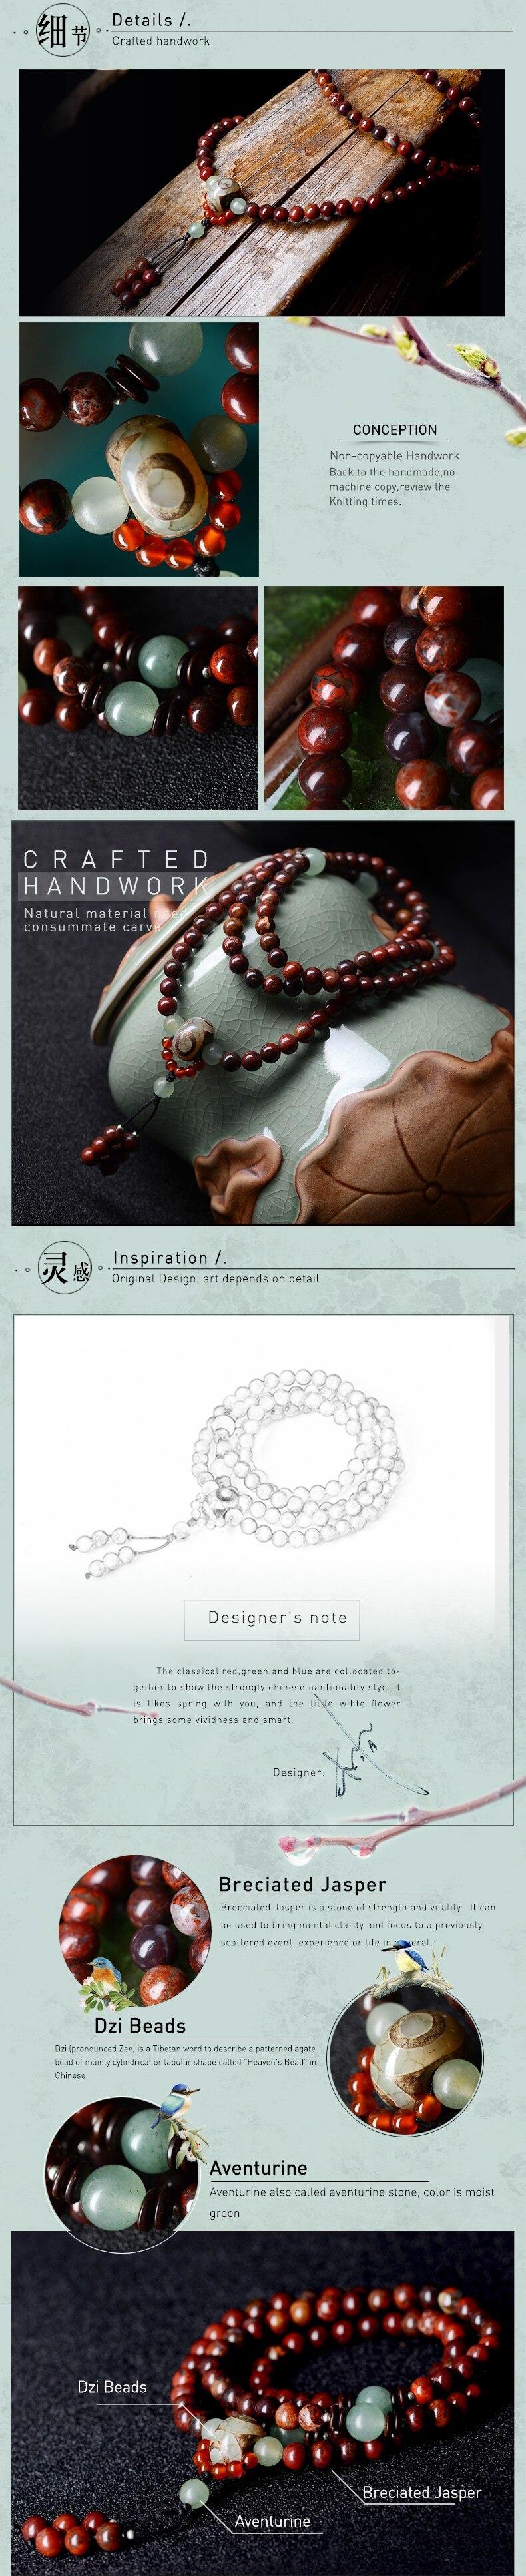 Beaded Bracelet vintage Dzi Beads pendant Bohhda Necklace natural stone handmade jewelry wrap charm Bracelets for women 19 4